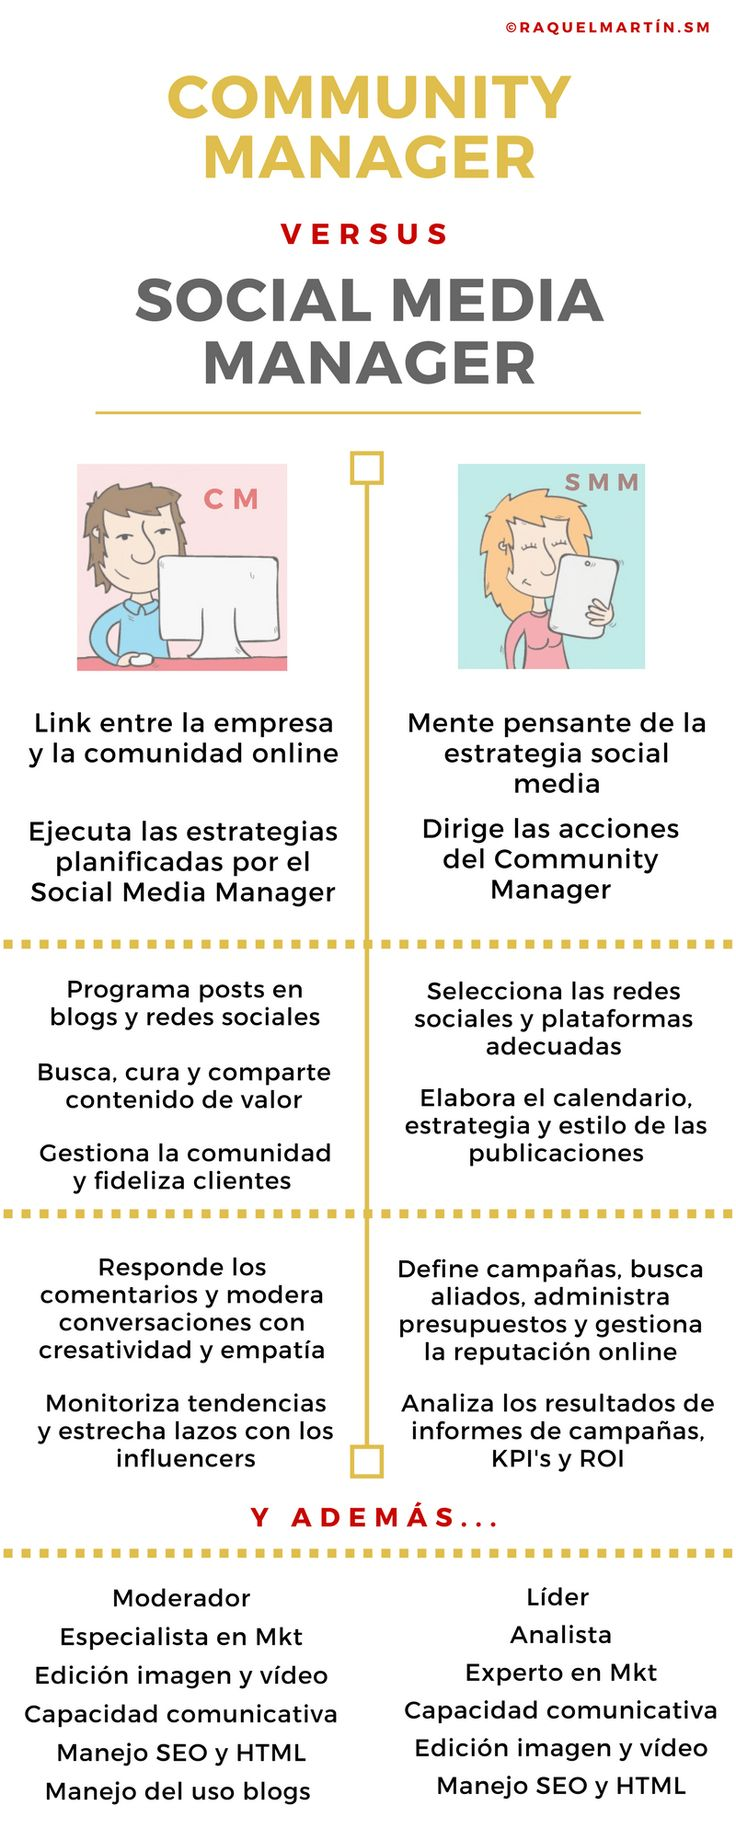 Community Manager vs Social Media Manager #infografia